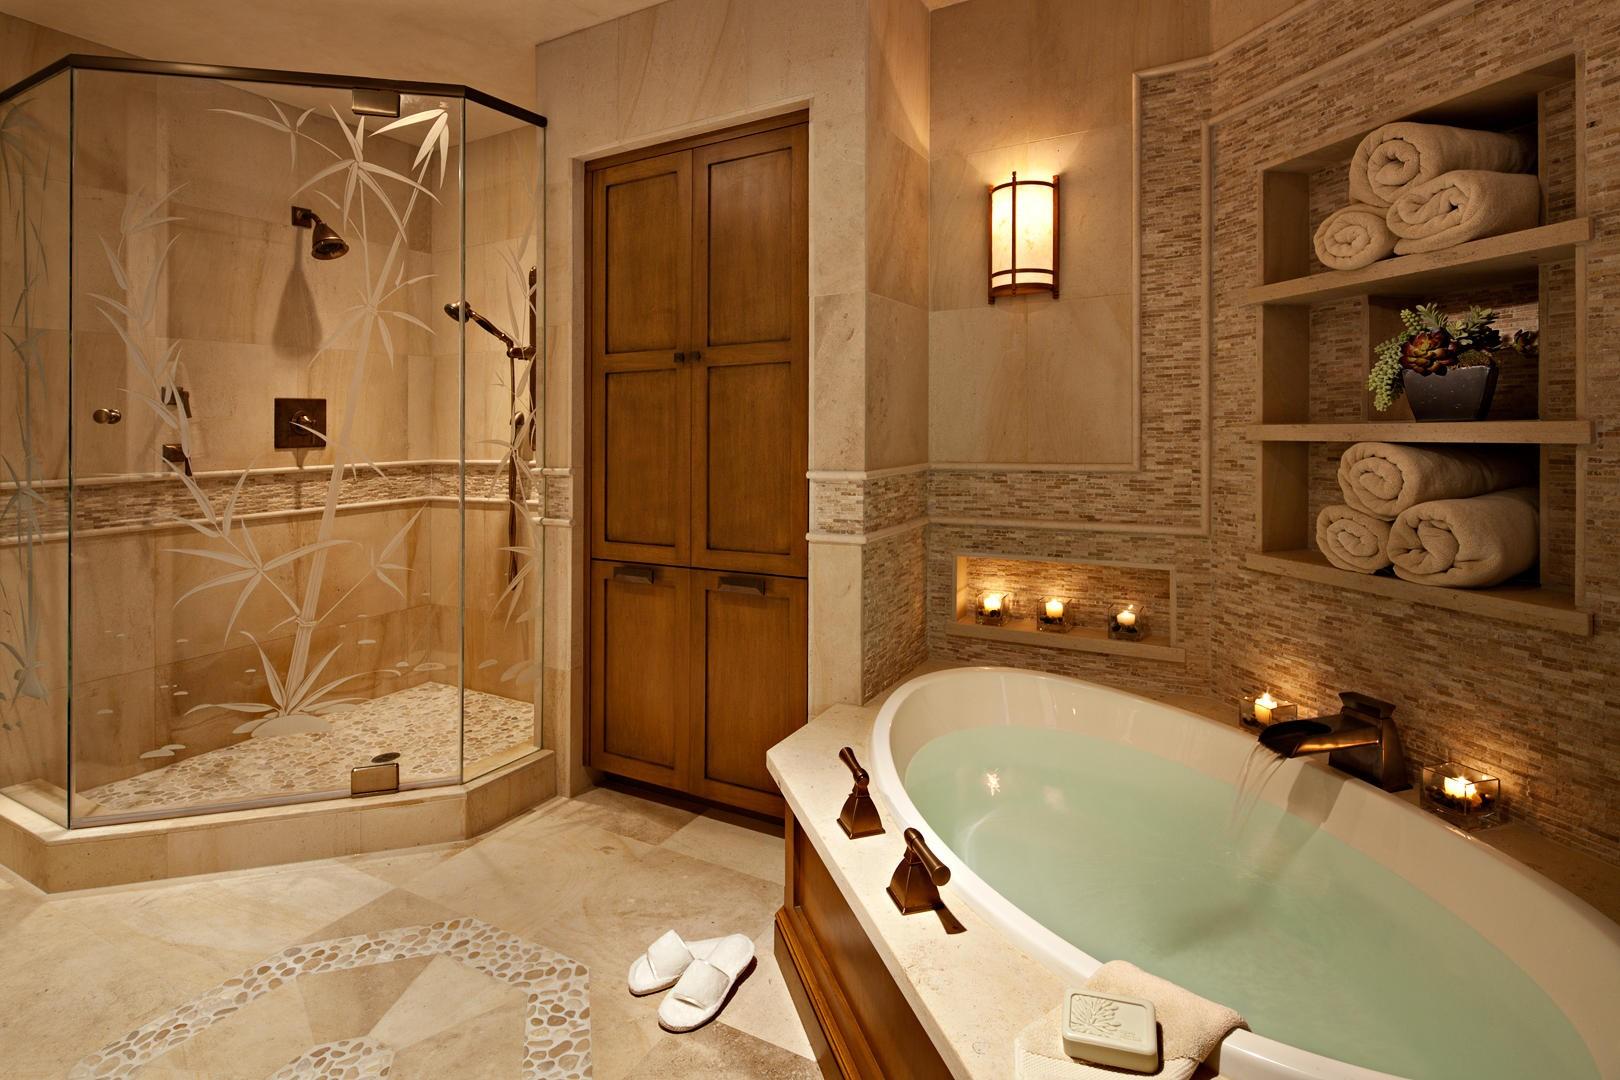 spa bathroom pictures photo - 1